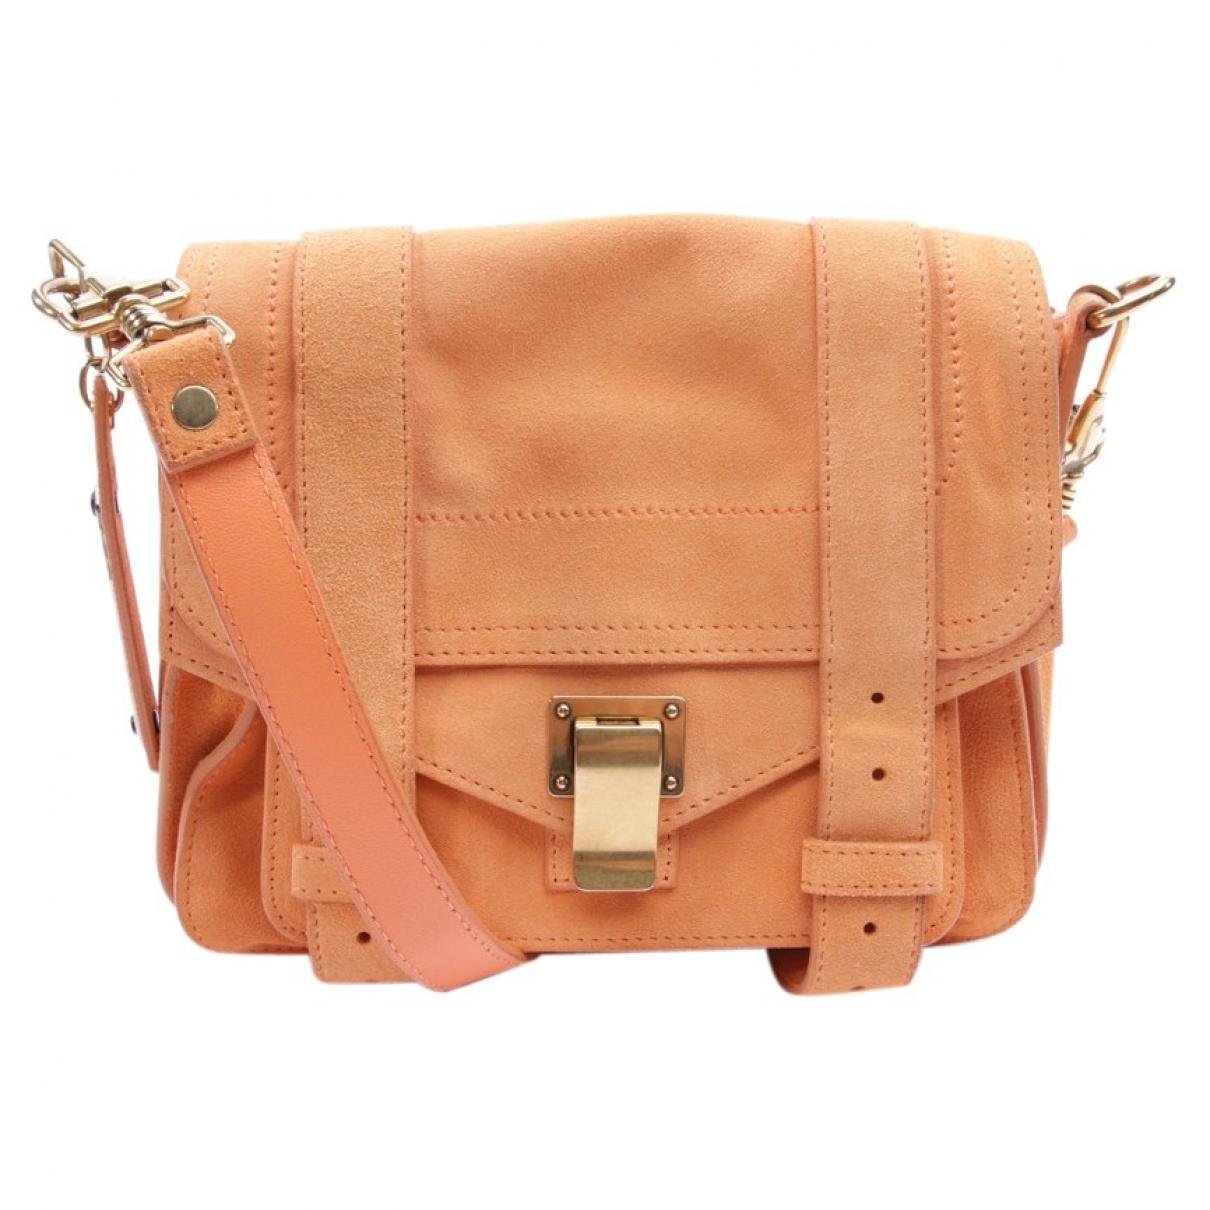 Proenza Schouler \N Orange Leather handbag for Women \N